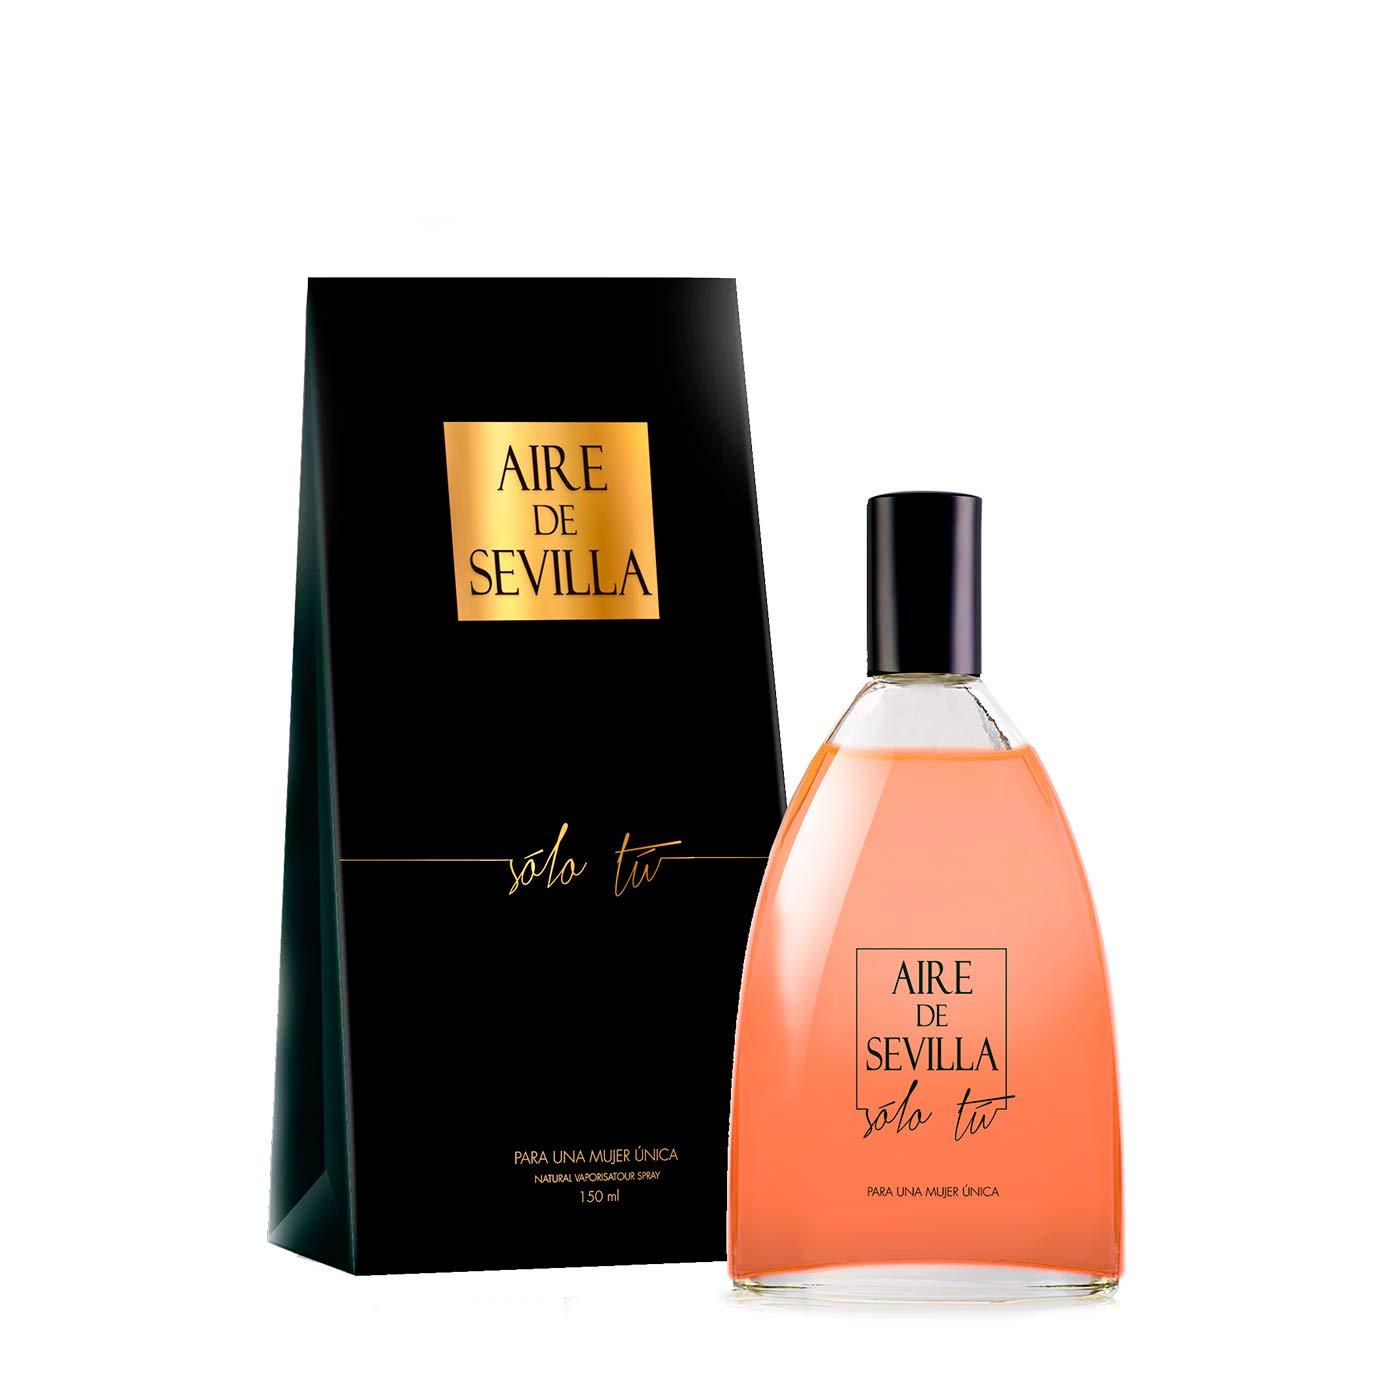 Aire de Sevilla - Solo Tú - Perfume Mujer 150ML: Amazon.es